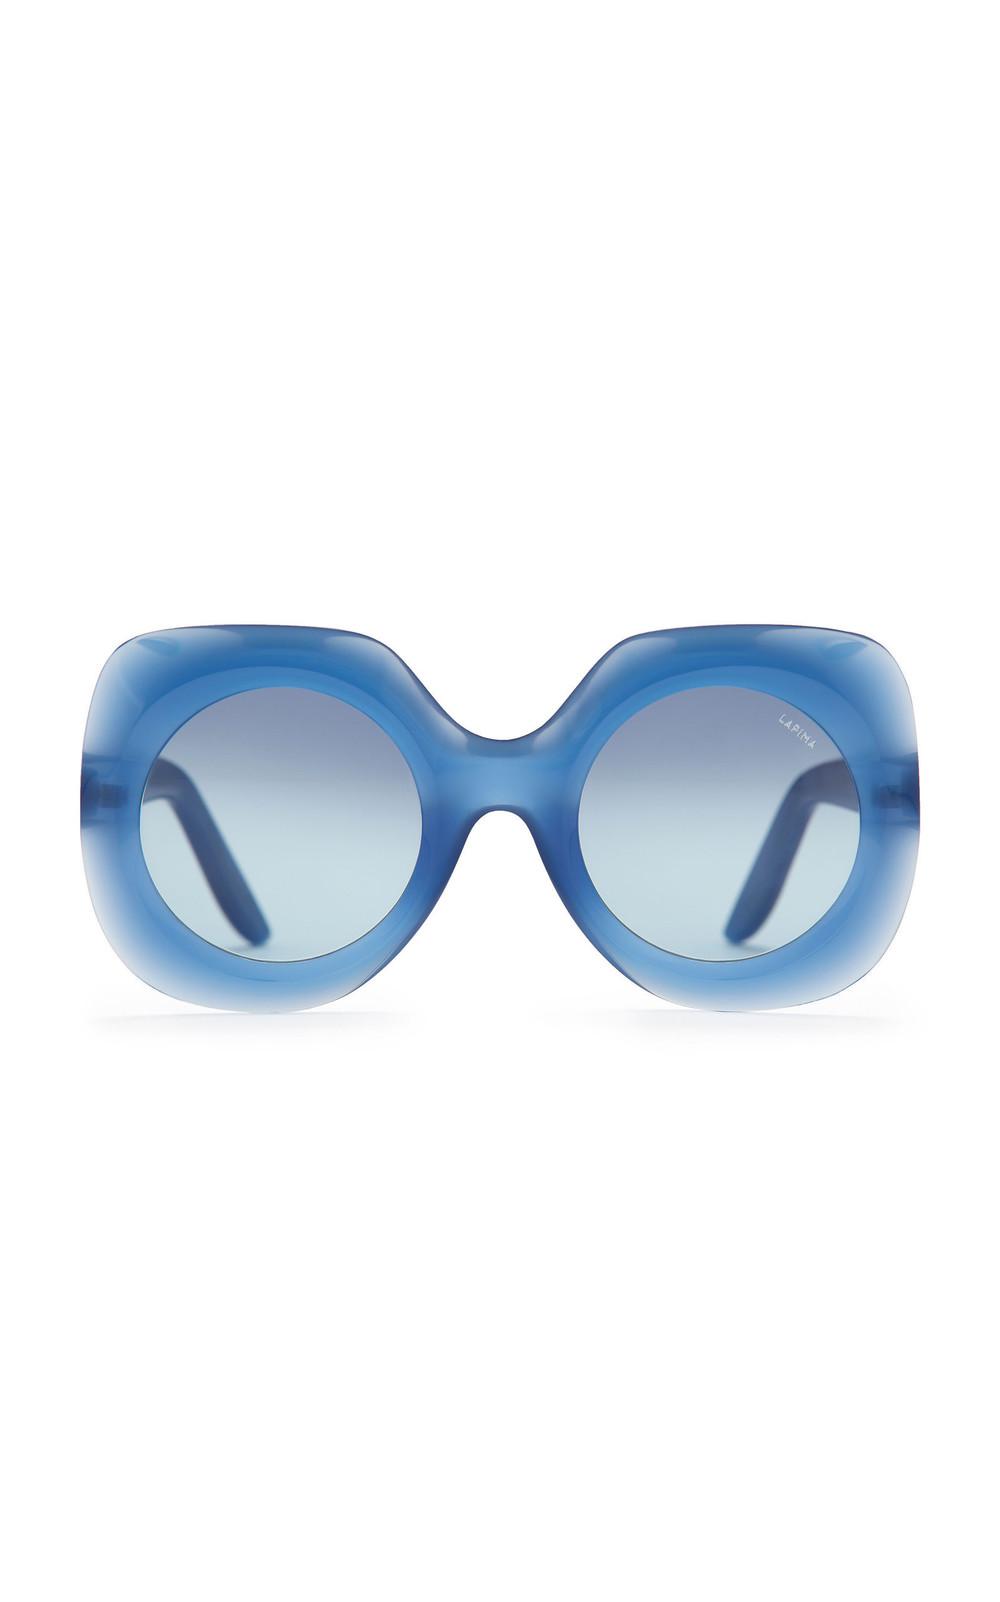 Lapima Paula Round-Frame Acetate Sunglasses in blue